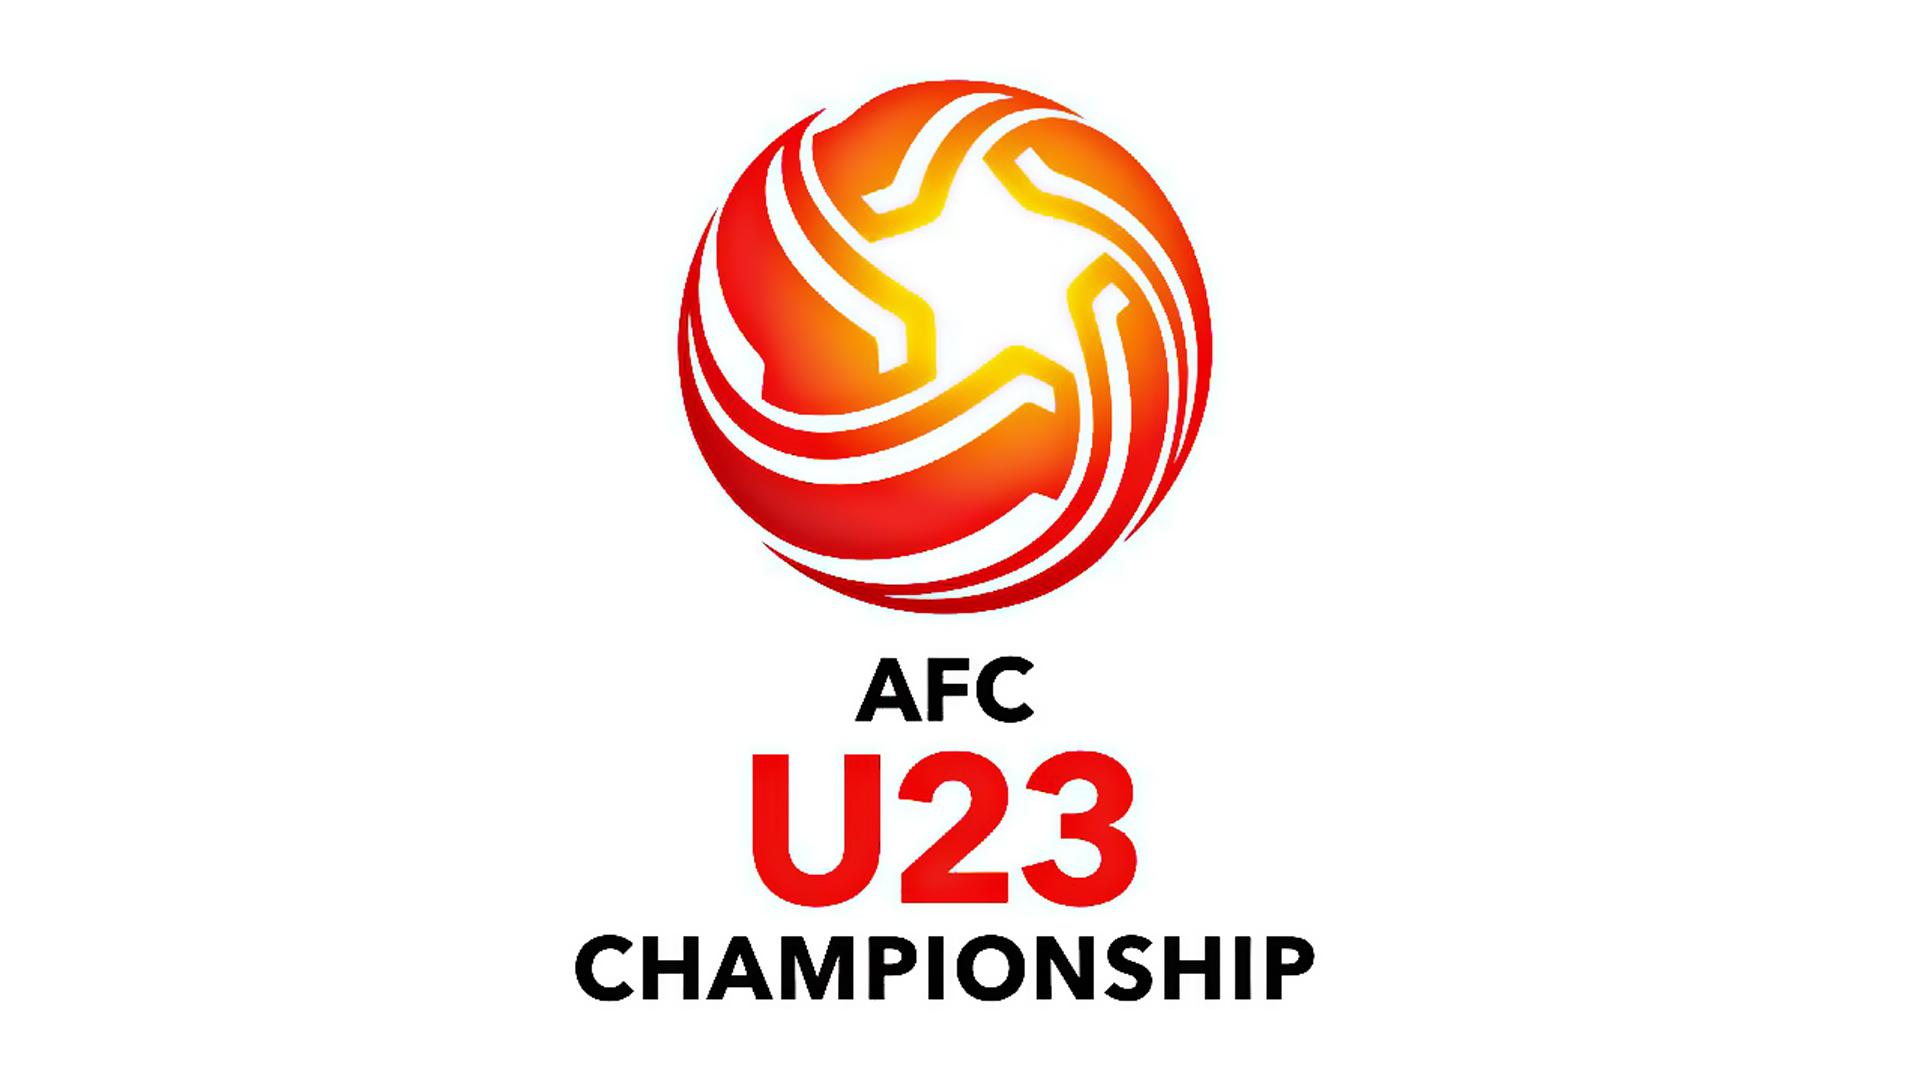 U23亚洲杯预选赛分组:中国遇菲律宾、老挝、马来西亚